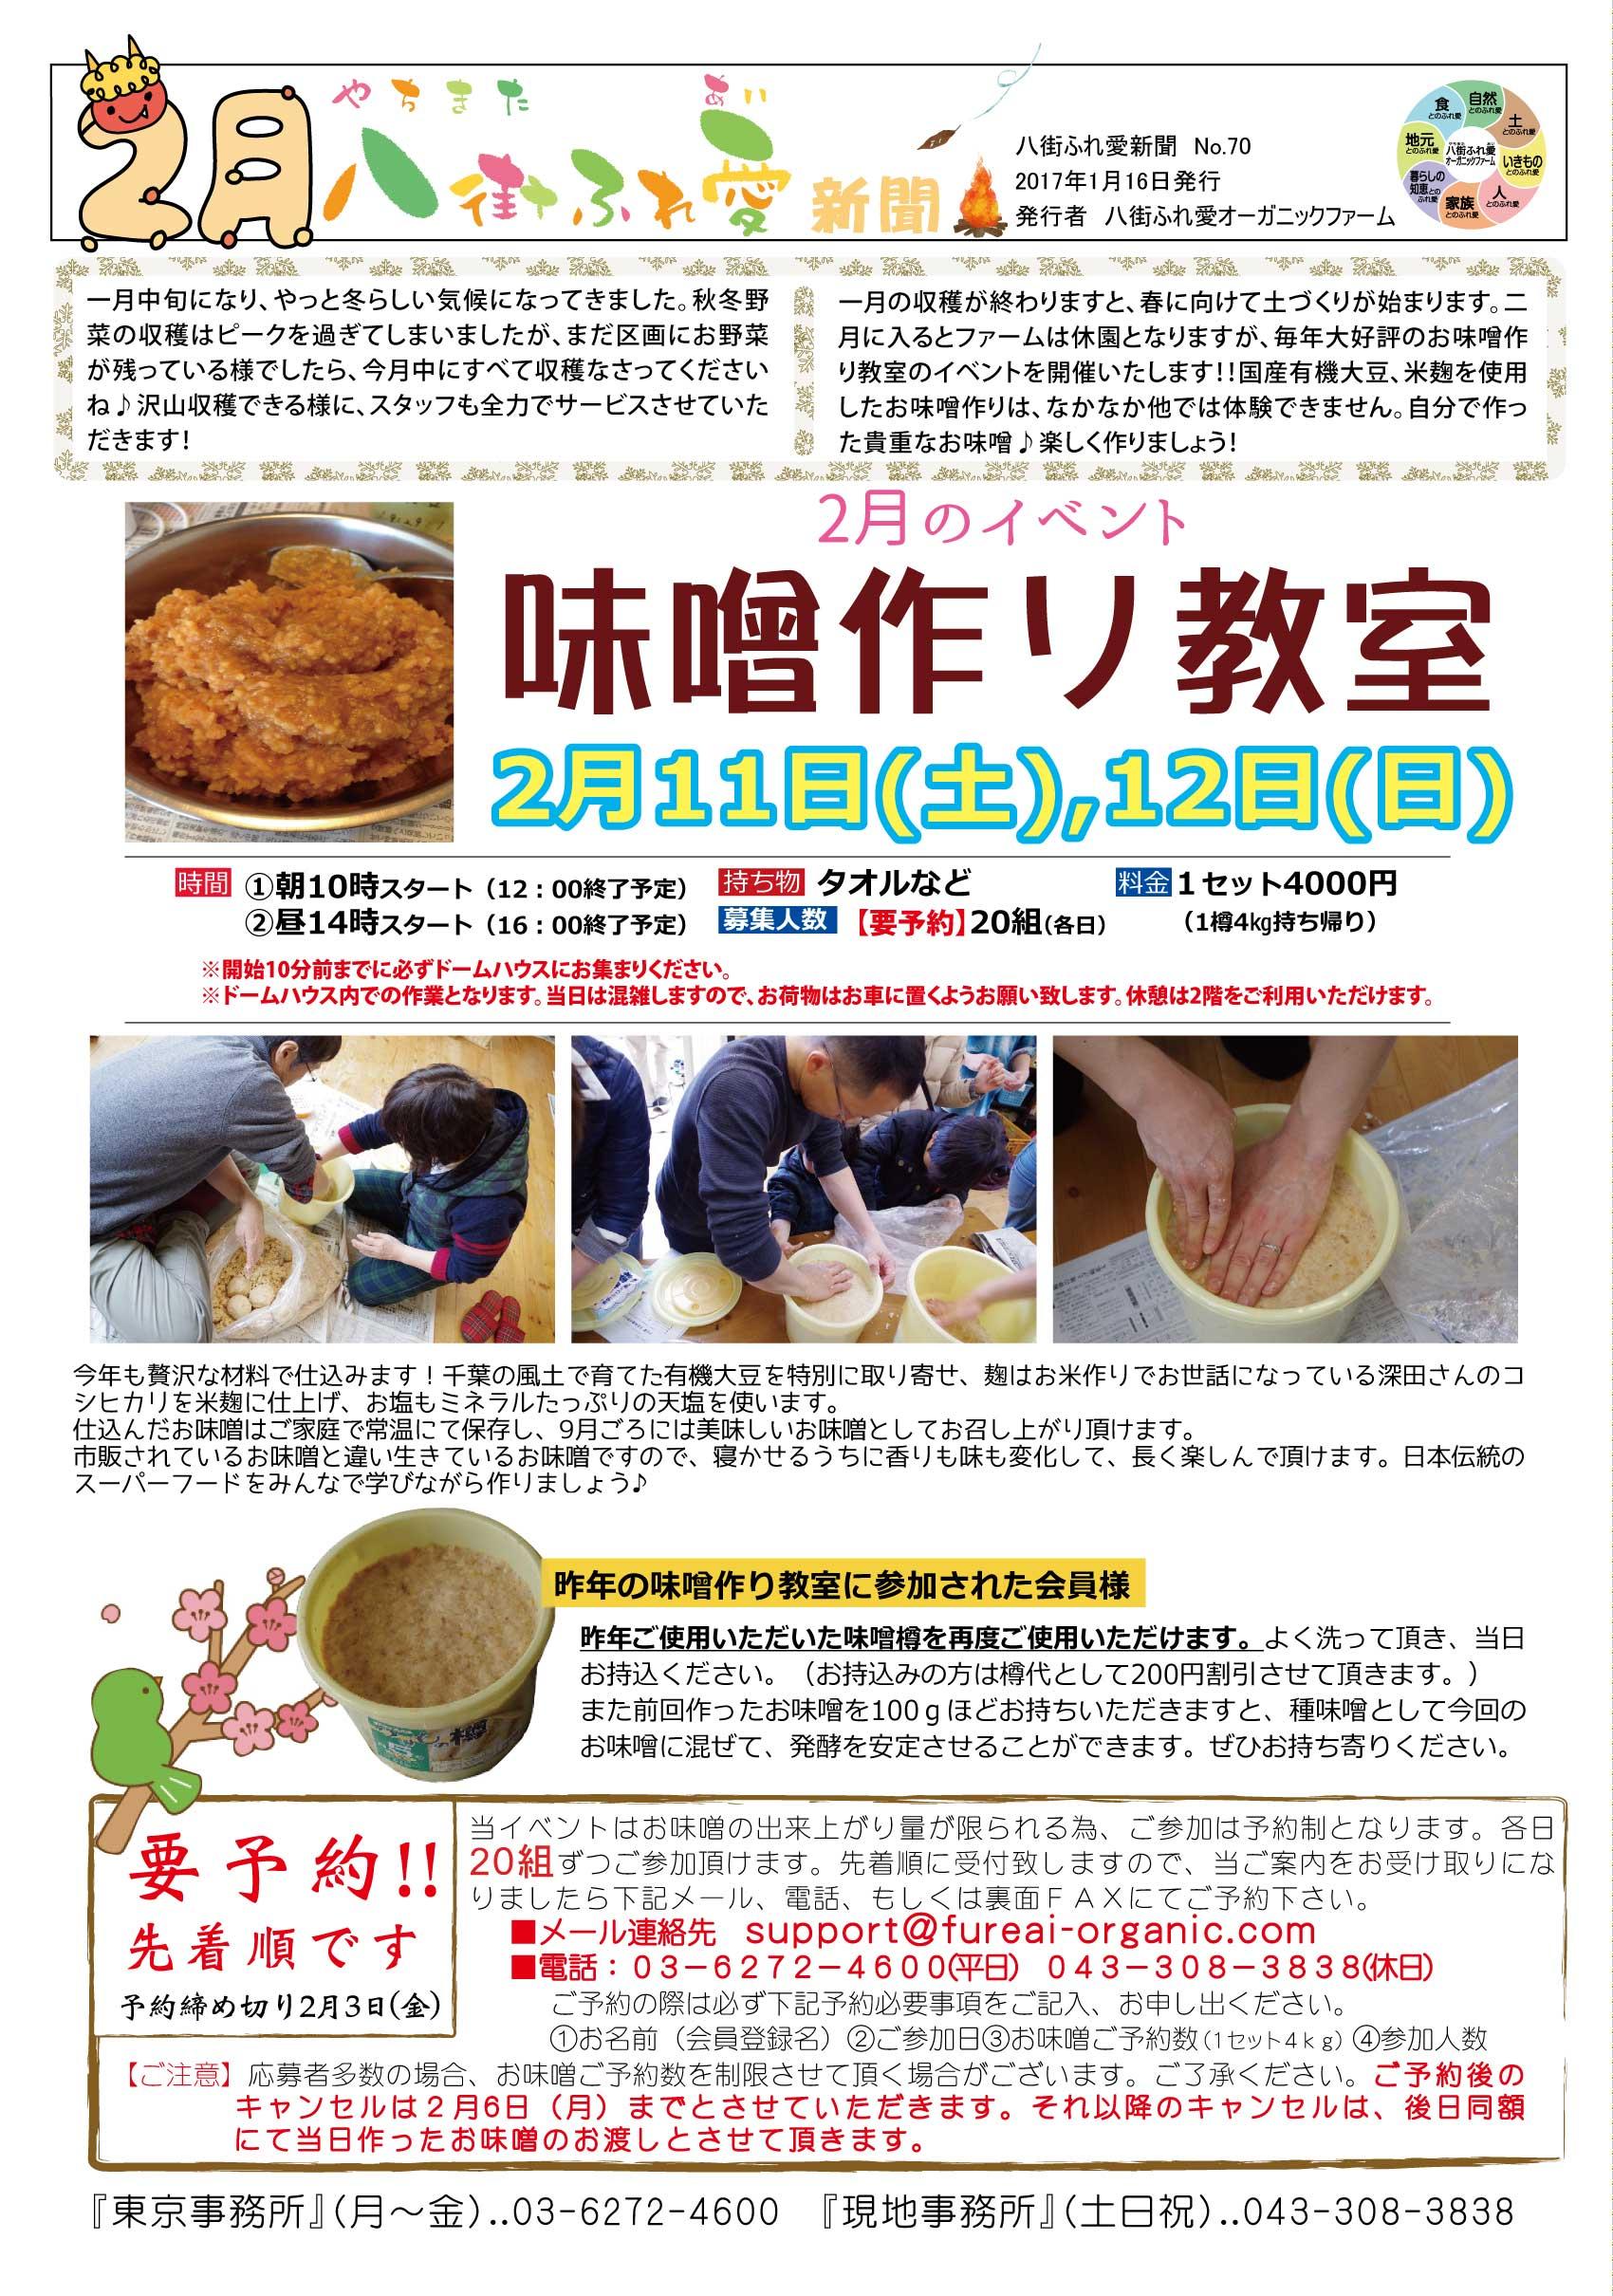 味噌作り教室 2月11日(土)、12日(日)